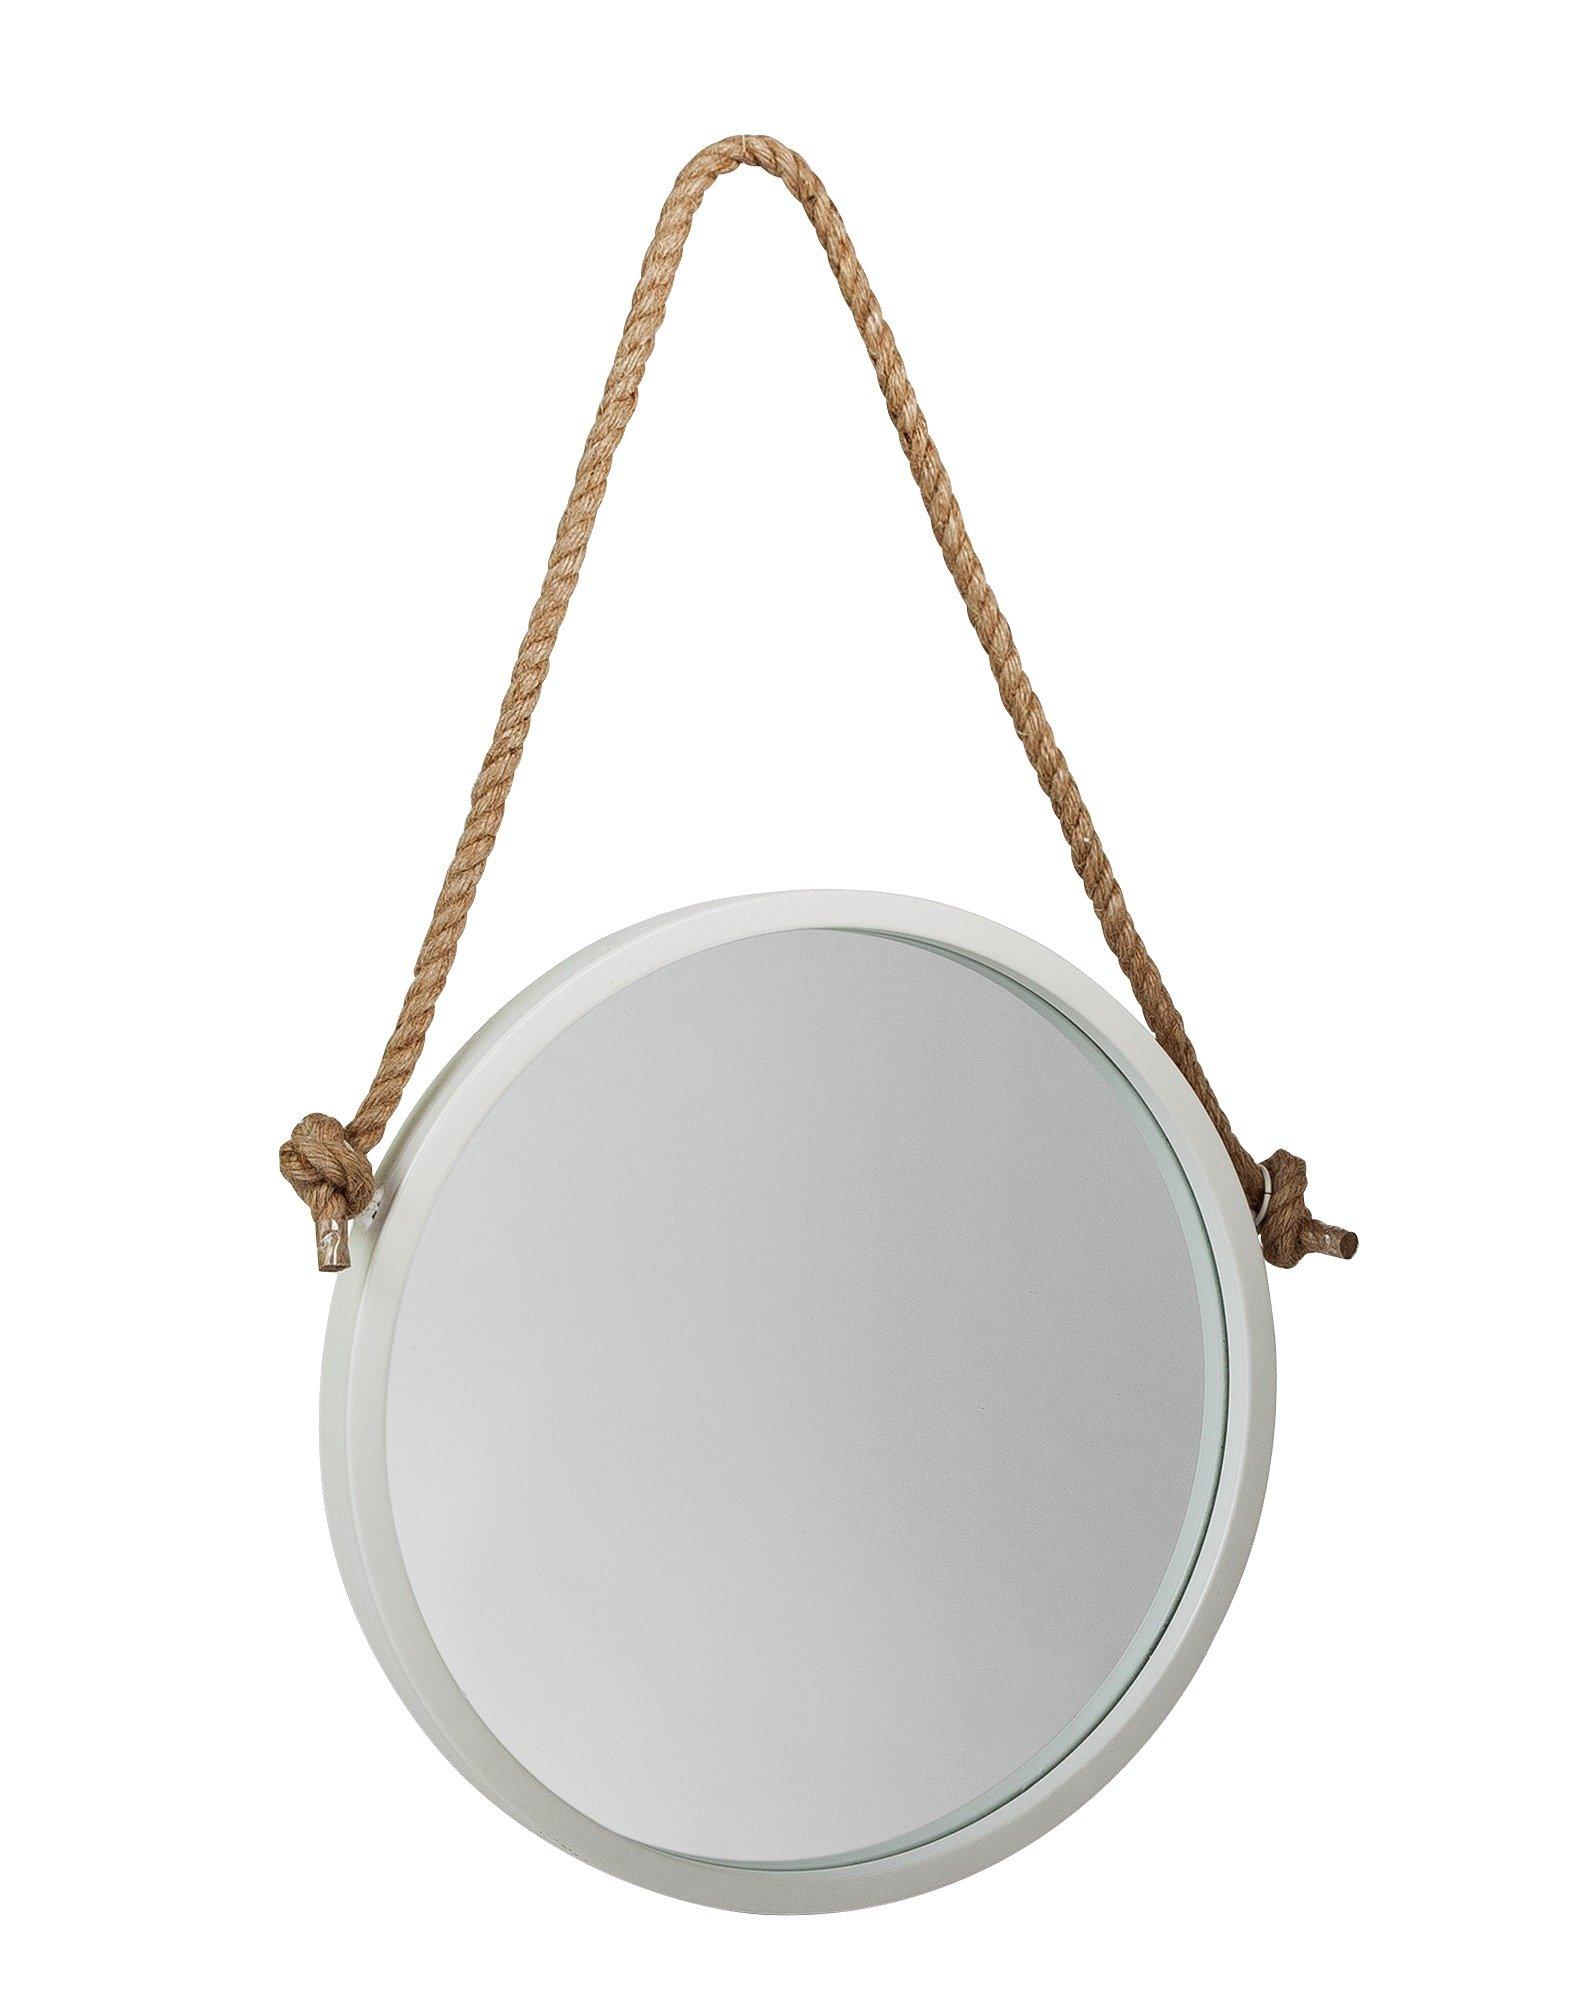 Argos Home Nautical Circular Rope Mirror - White